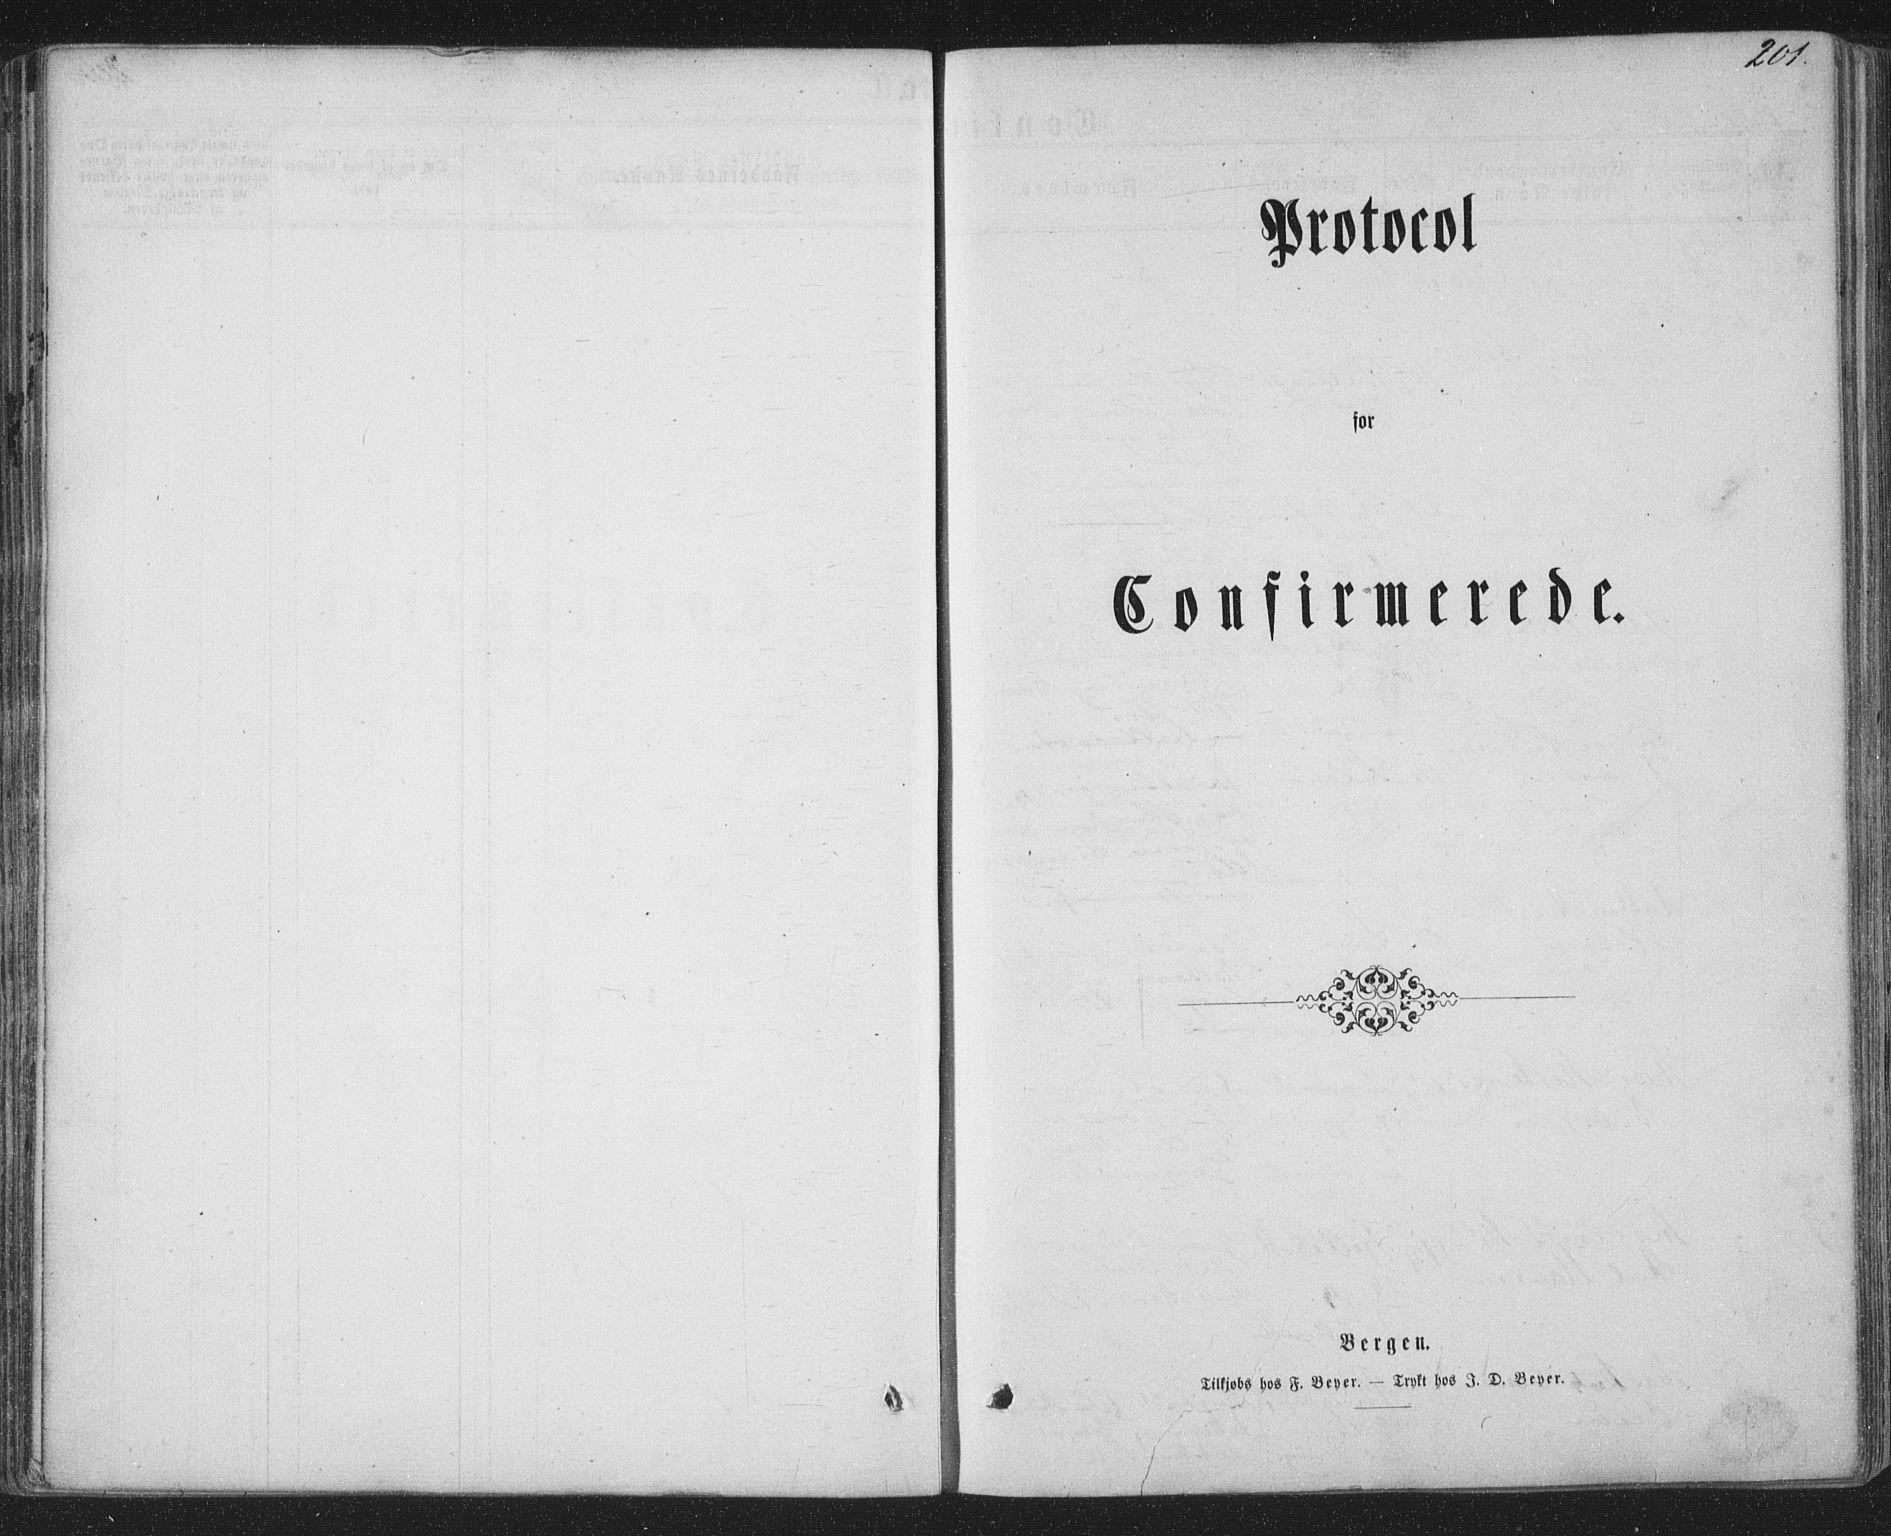 SAT, Ministerialprotokoller, klokkerbøker og fødselsregistre - Nordland, 863/L0896: Ministerialbok nr. 863A08, 1861-1871, s. 201